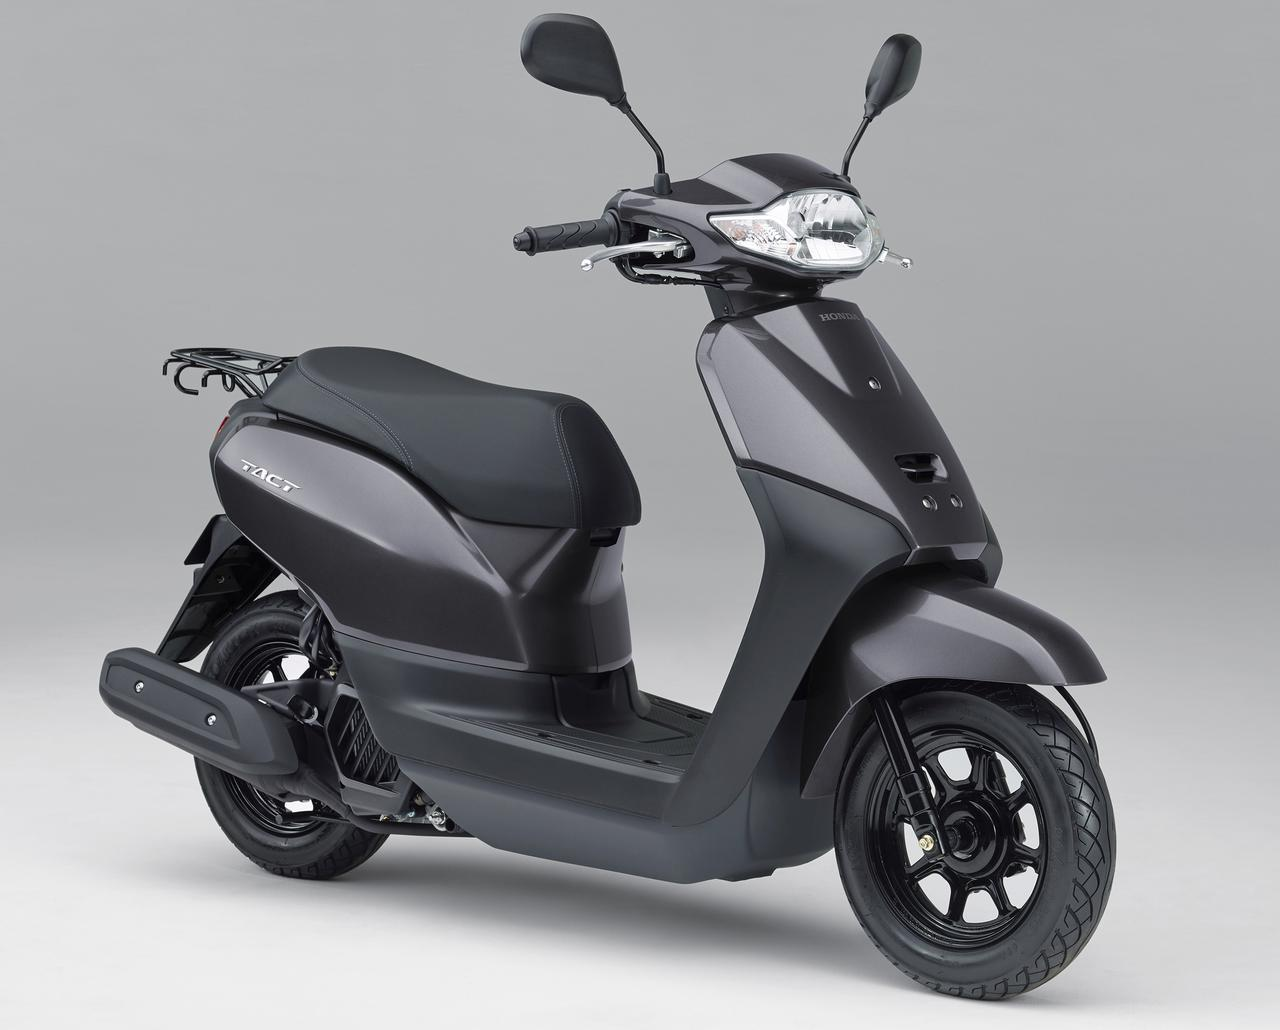 画像: Honda TACT BASIC/TACT 税込価格:16万8300円/18万1500円